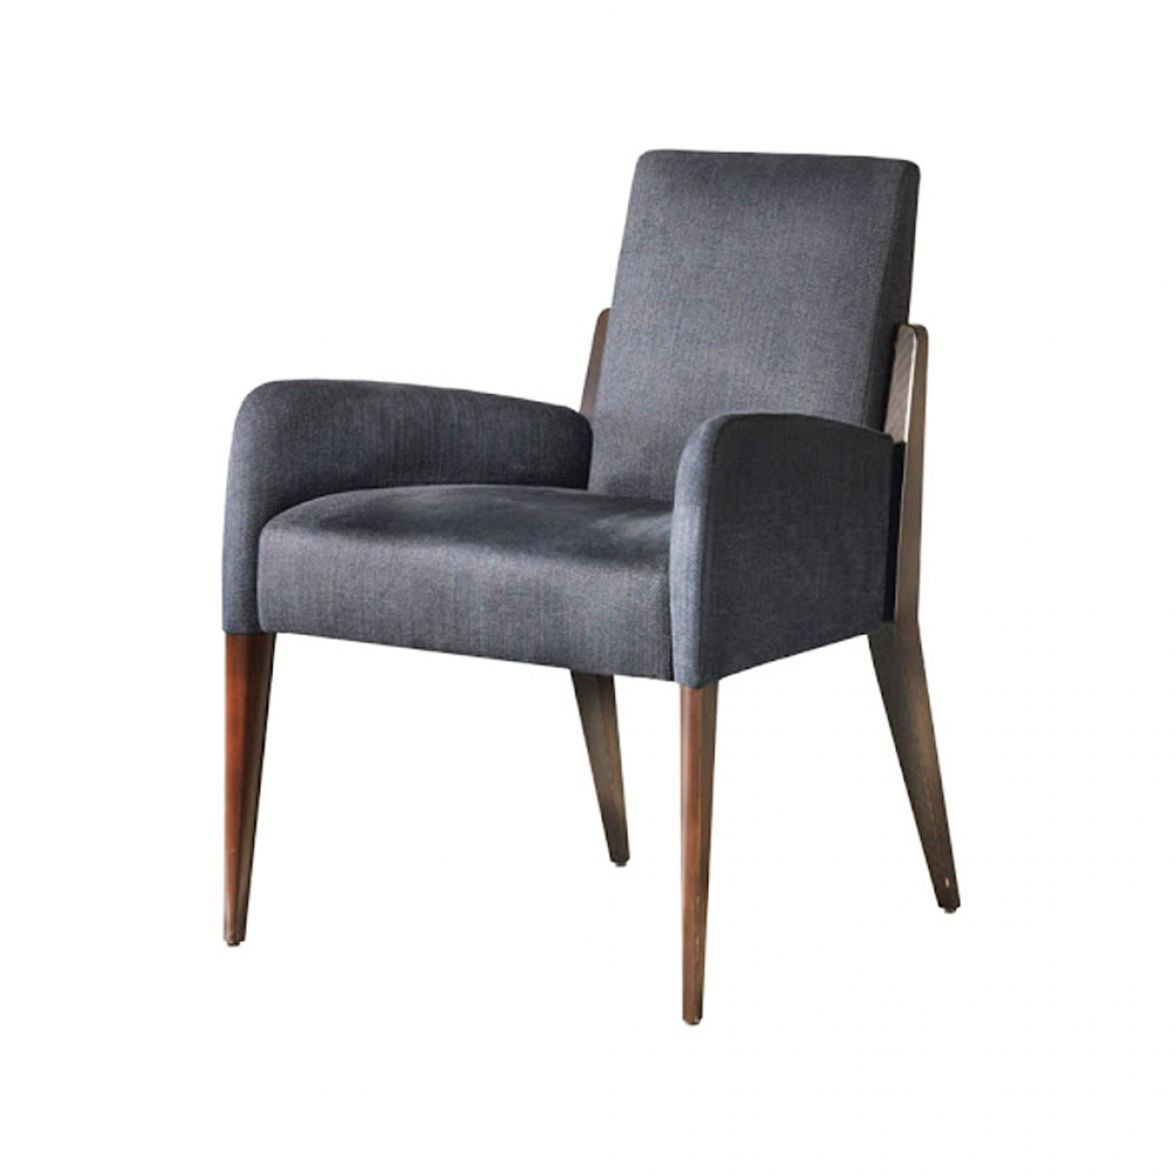 EMERALD armchair